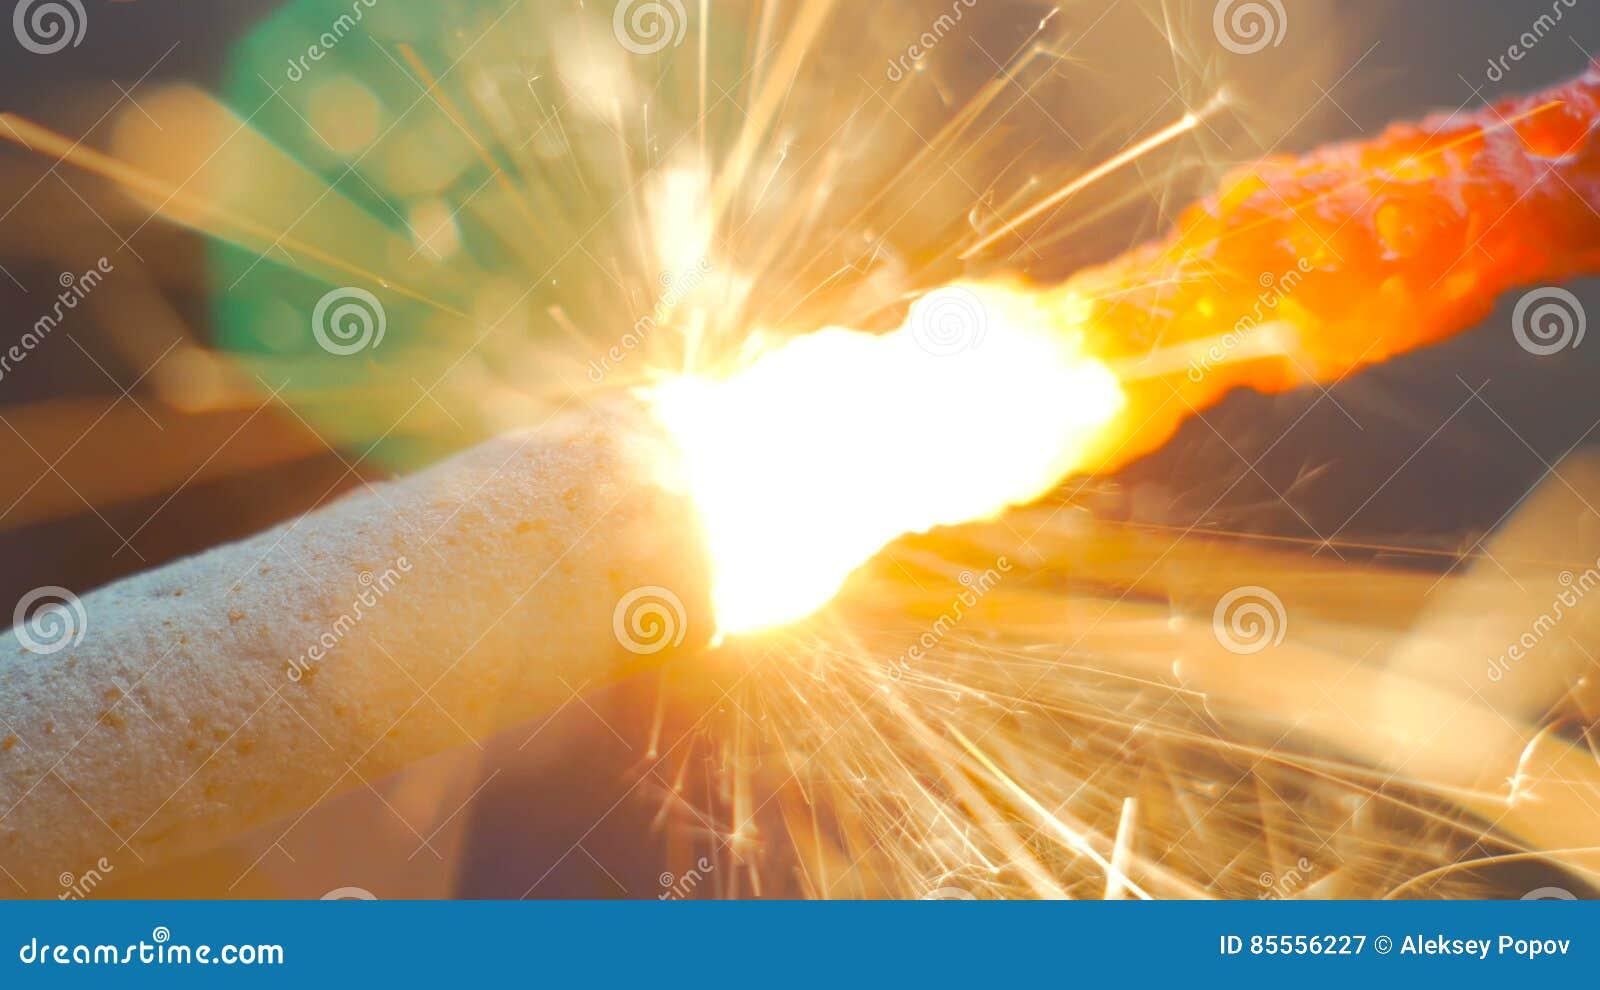 Feuerwerkswunderkerze Burning